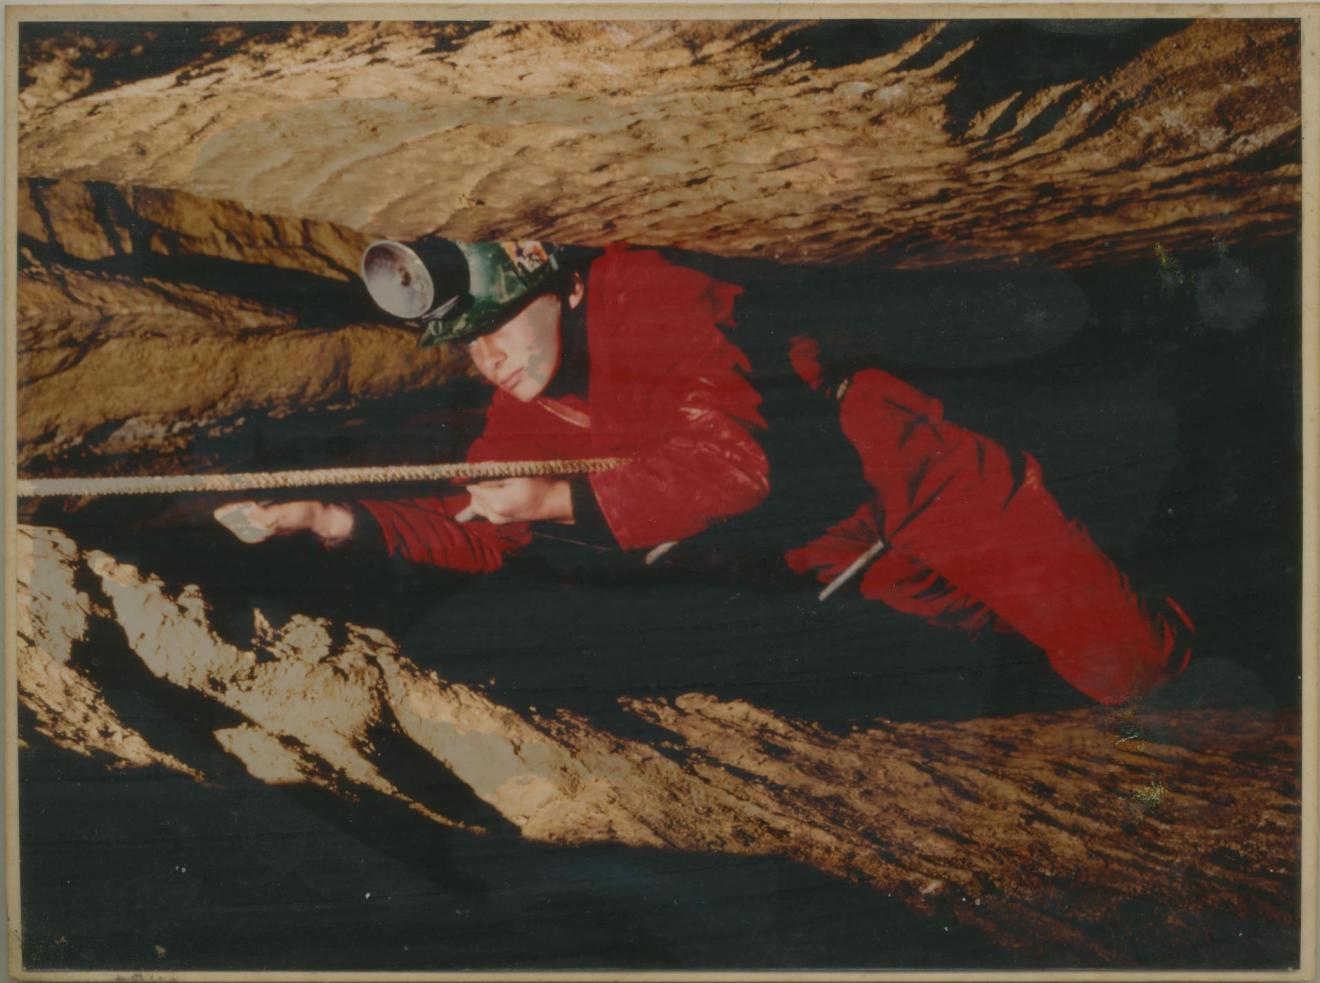 Image: Ben Stubbs in 1981 using a carbide headlamp. Photo by John Ash.